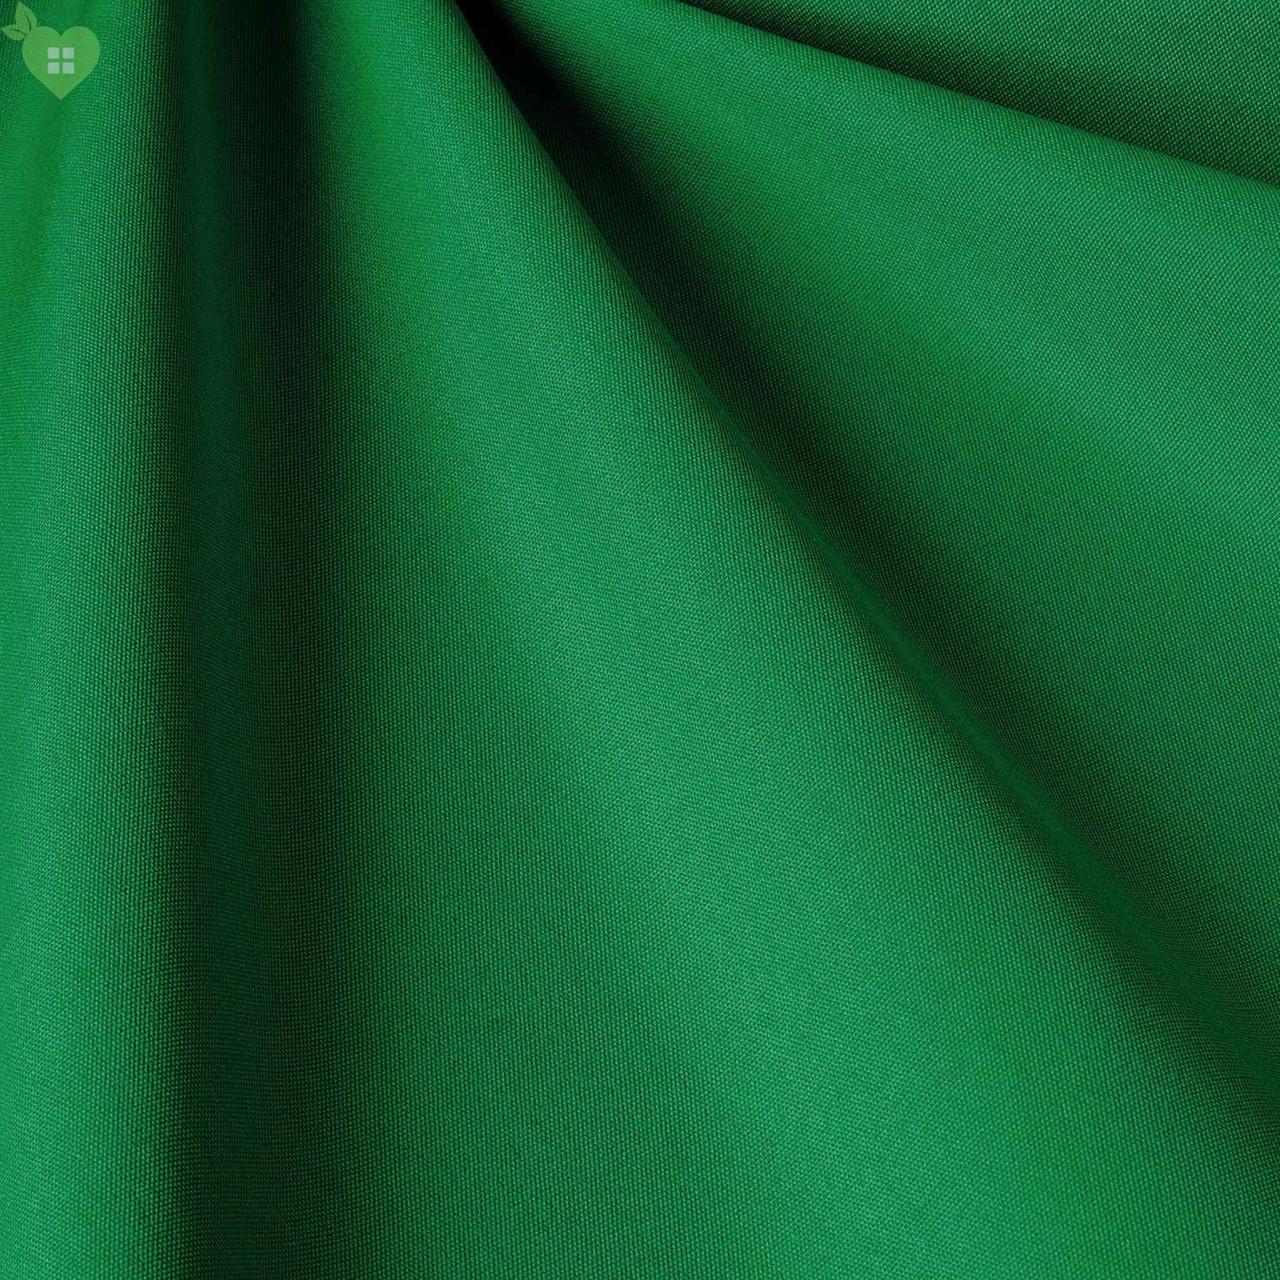 Ткань для улицы: Дралон (Outdoor) 400333v29